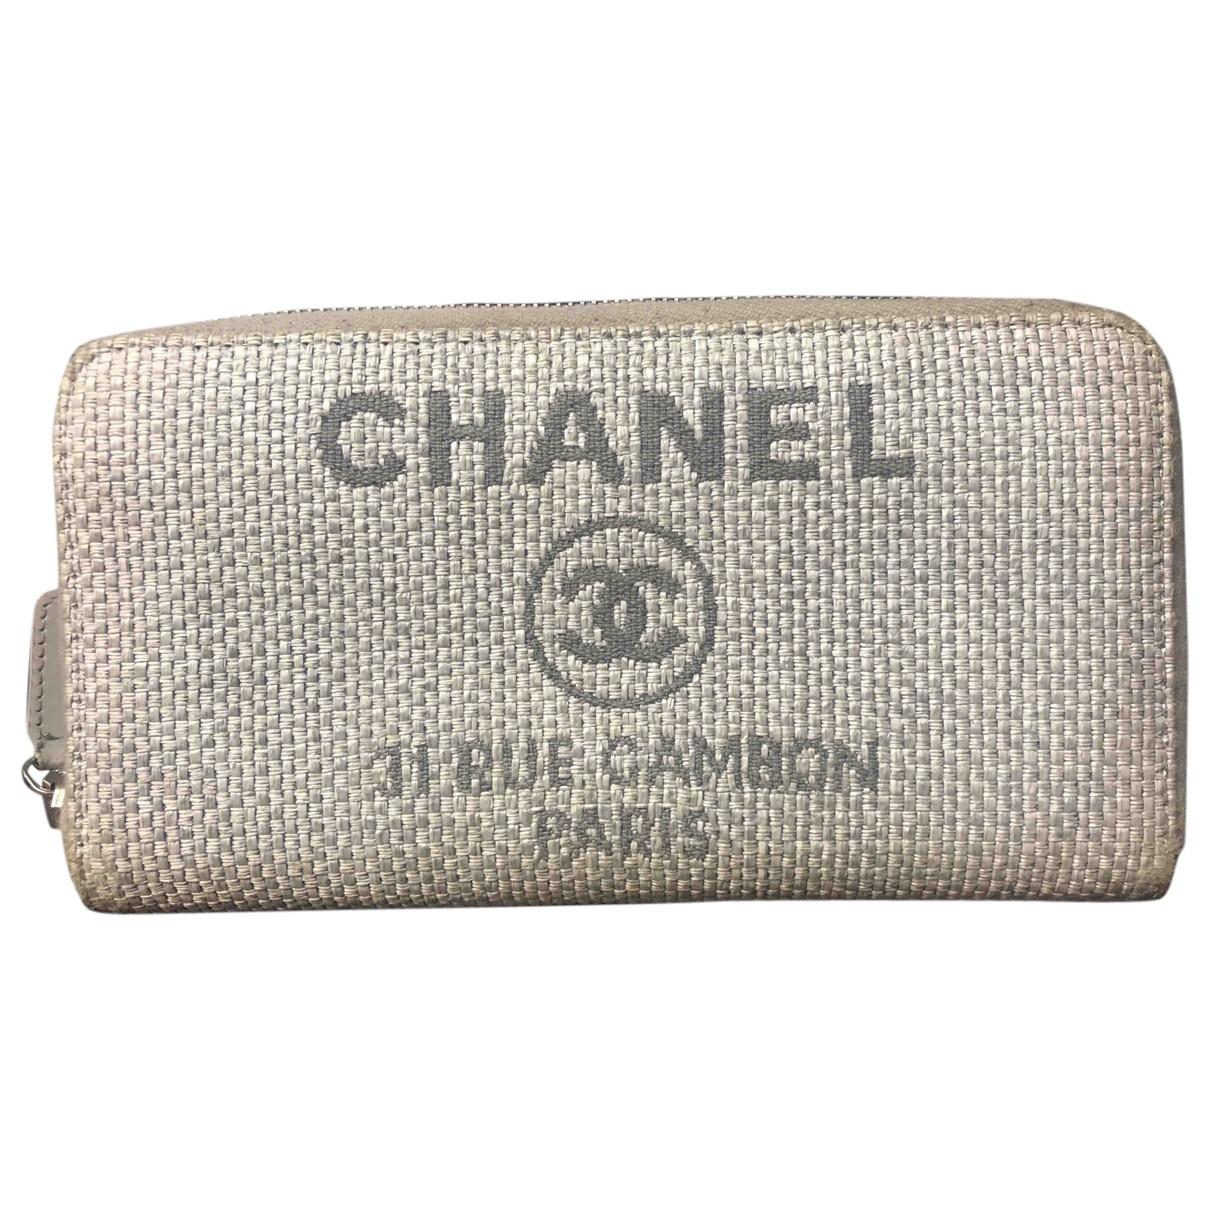 Chanel \N Portemonnaie in  Grau Leinen